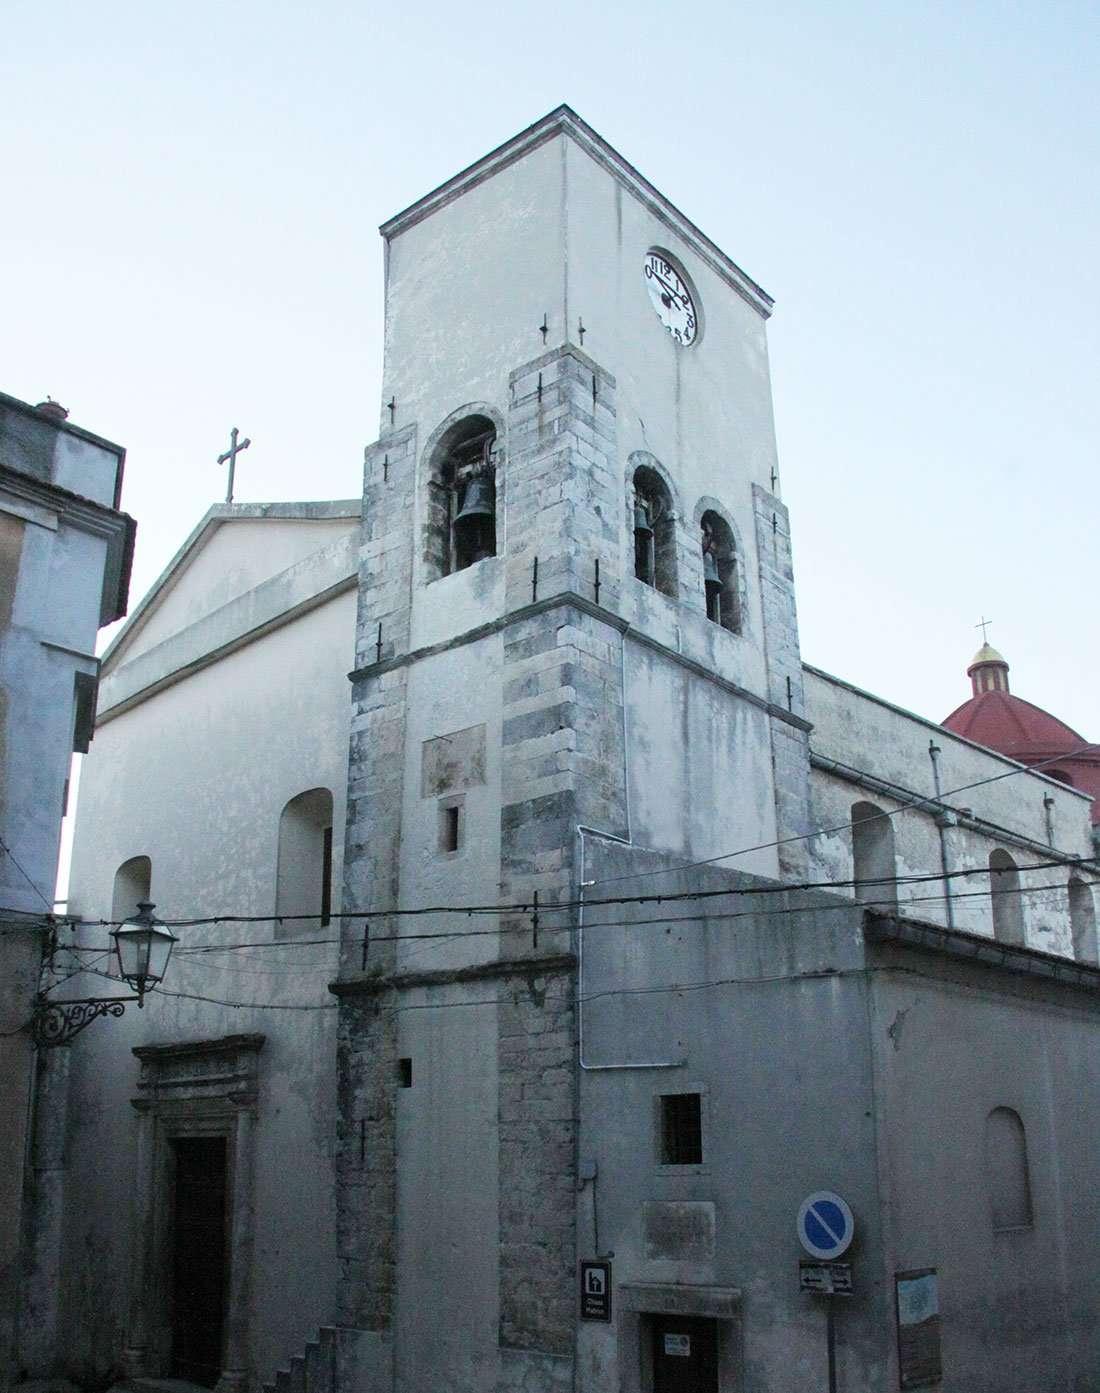 Vico del Gargano - Chiesa della Beatissima Vergine Assunta